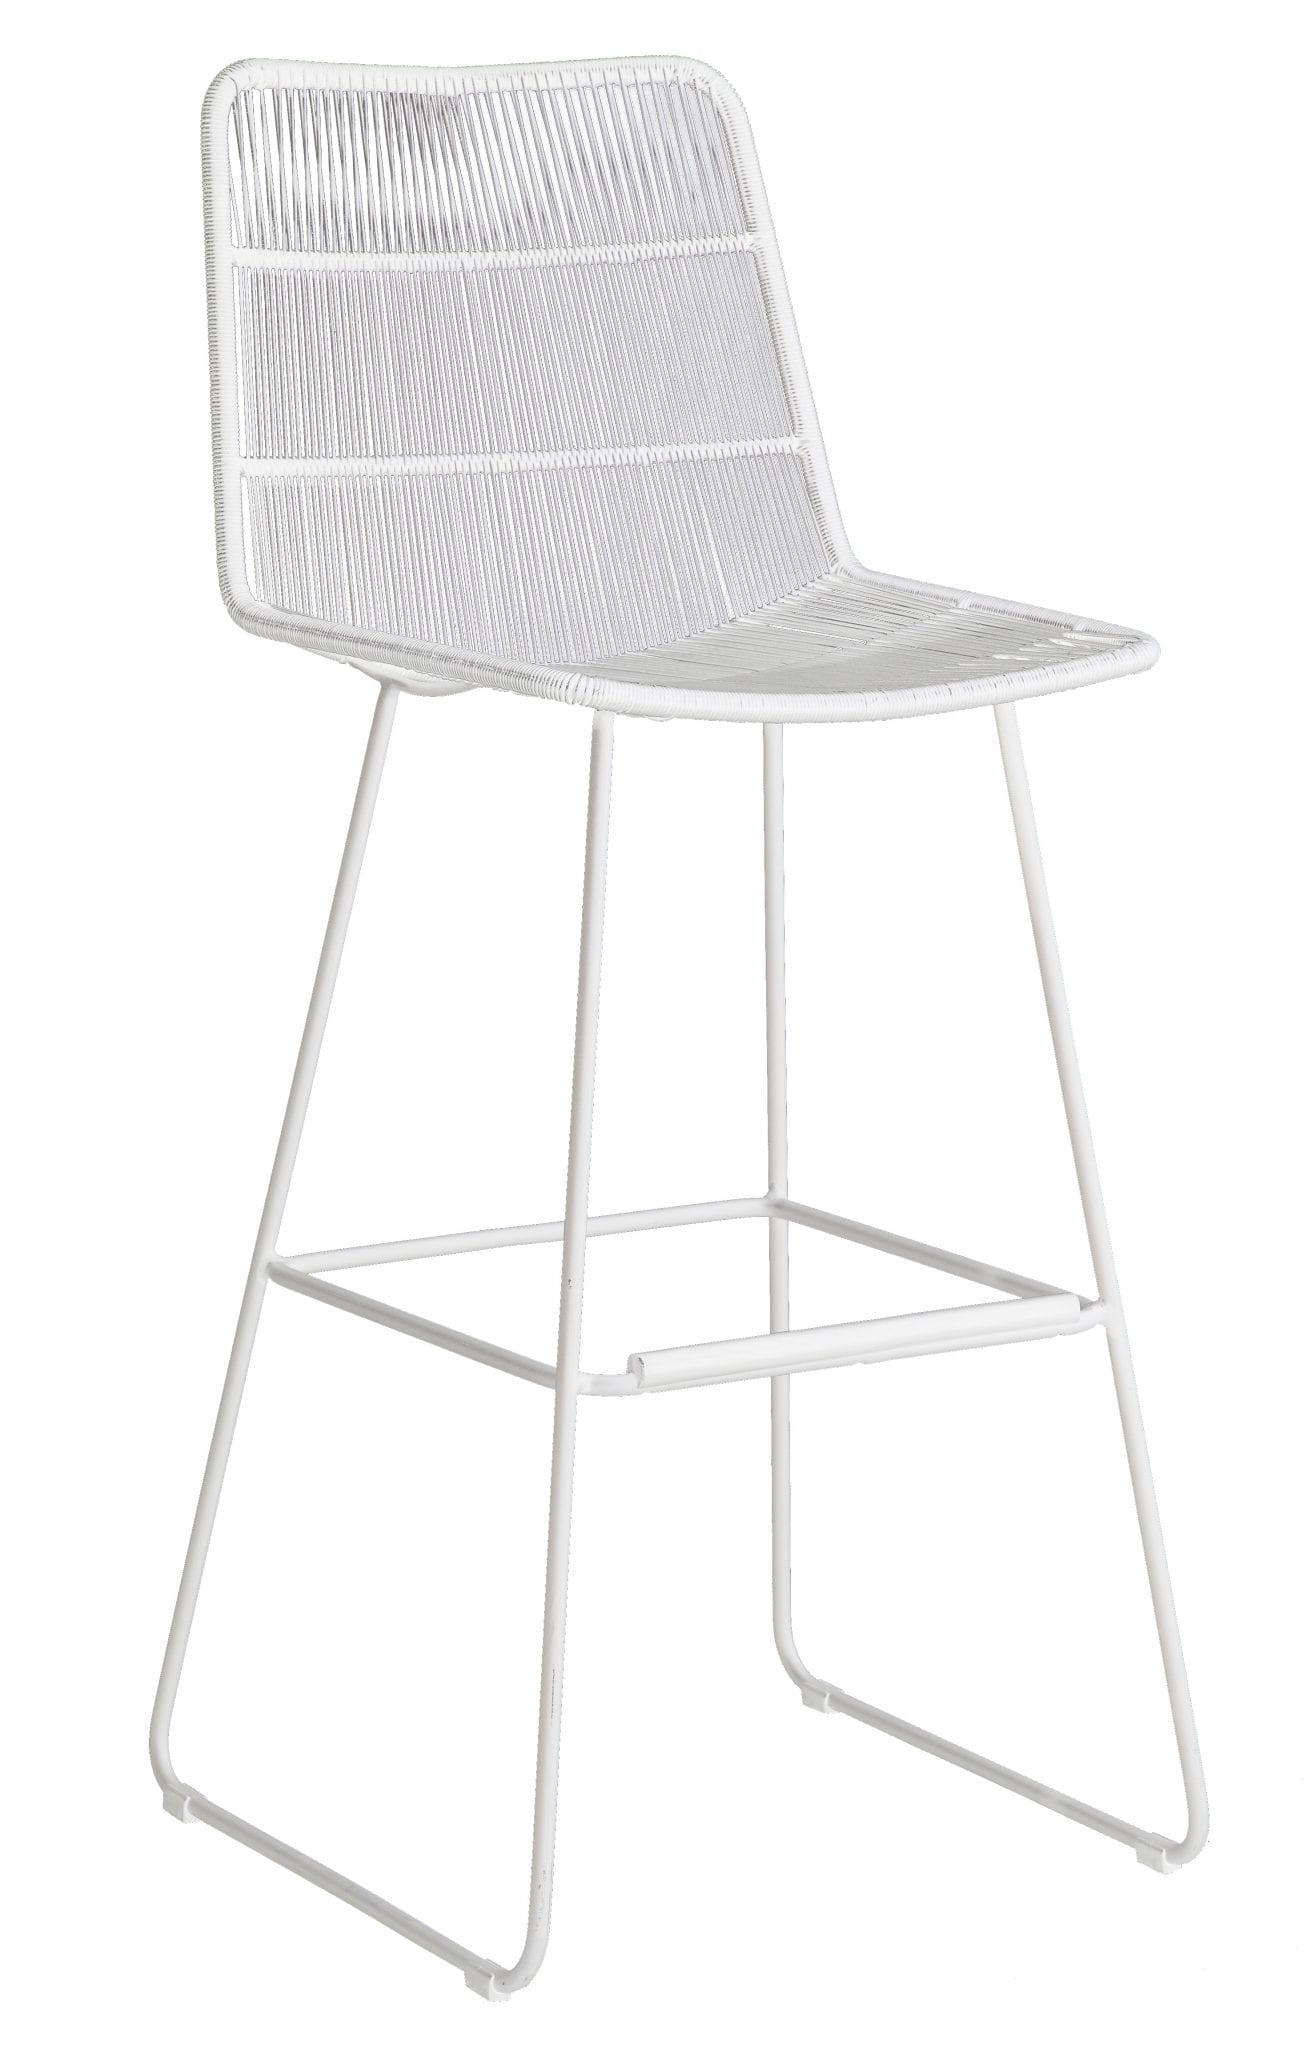 Faye bar chair - white | Maax & Luuk